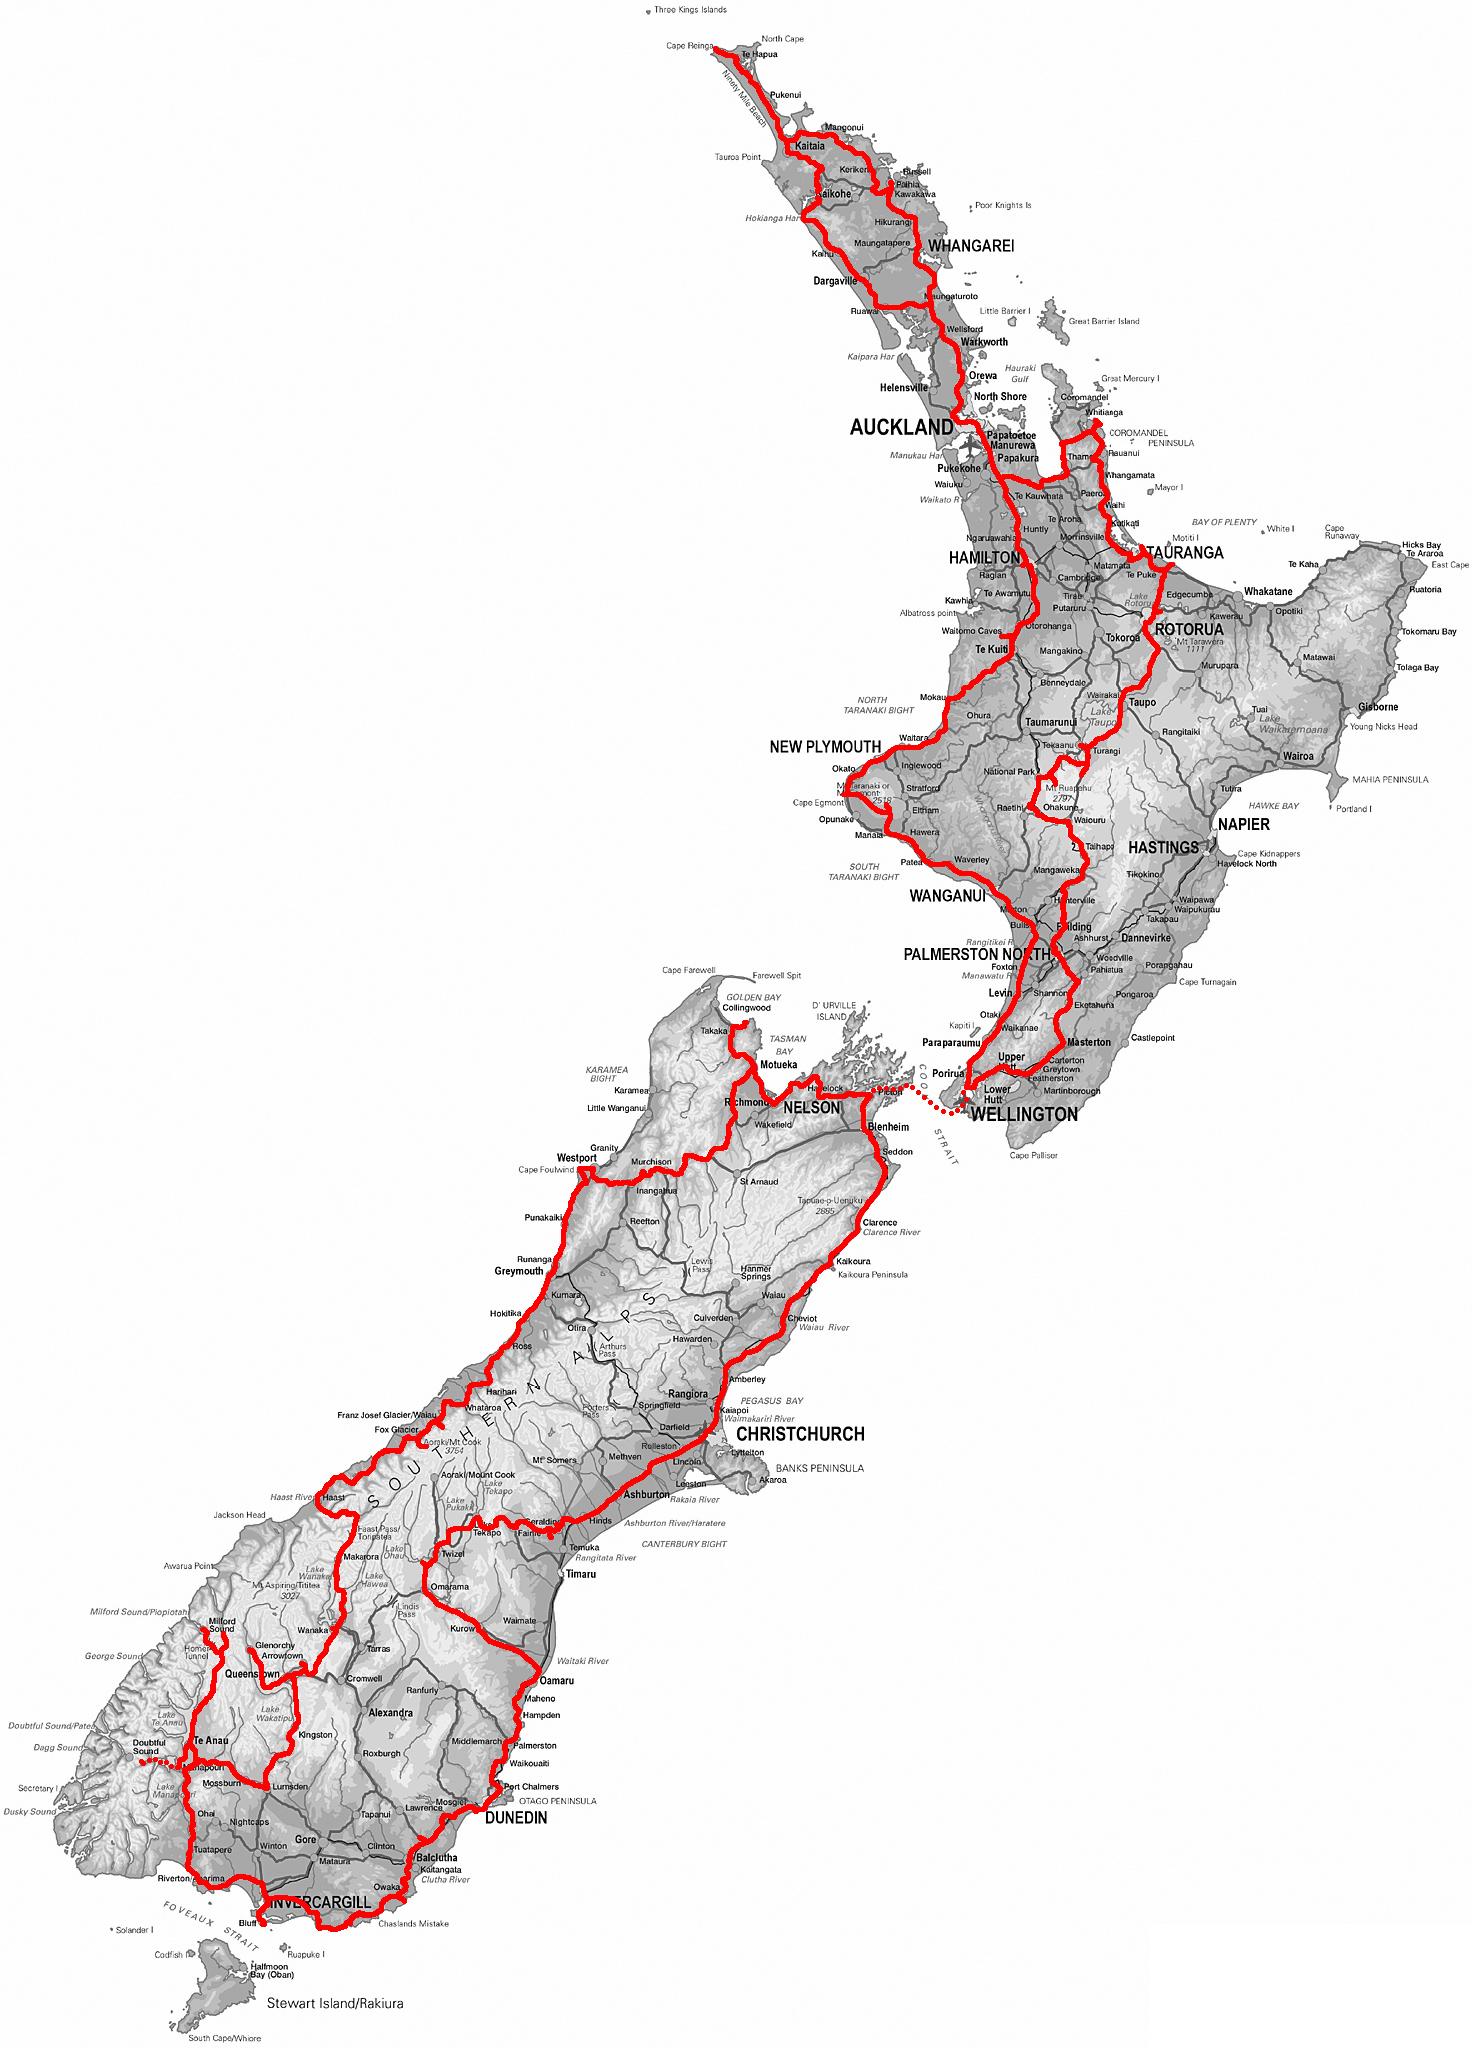 Neuseeland Nordinsel Karte.Neuseeland In 32 Tagen